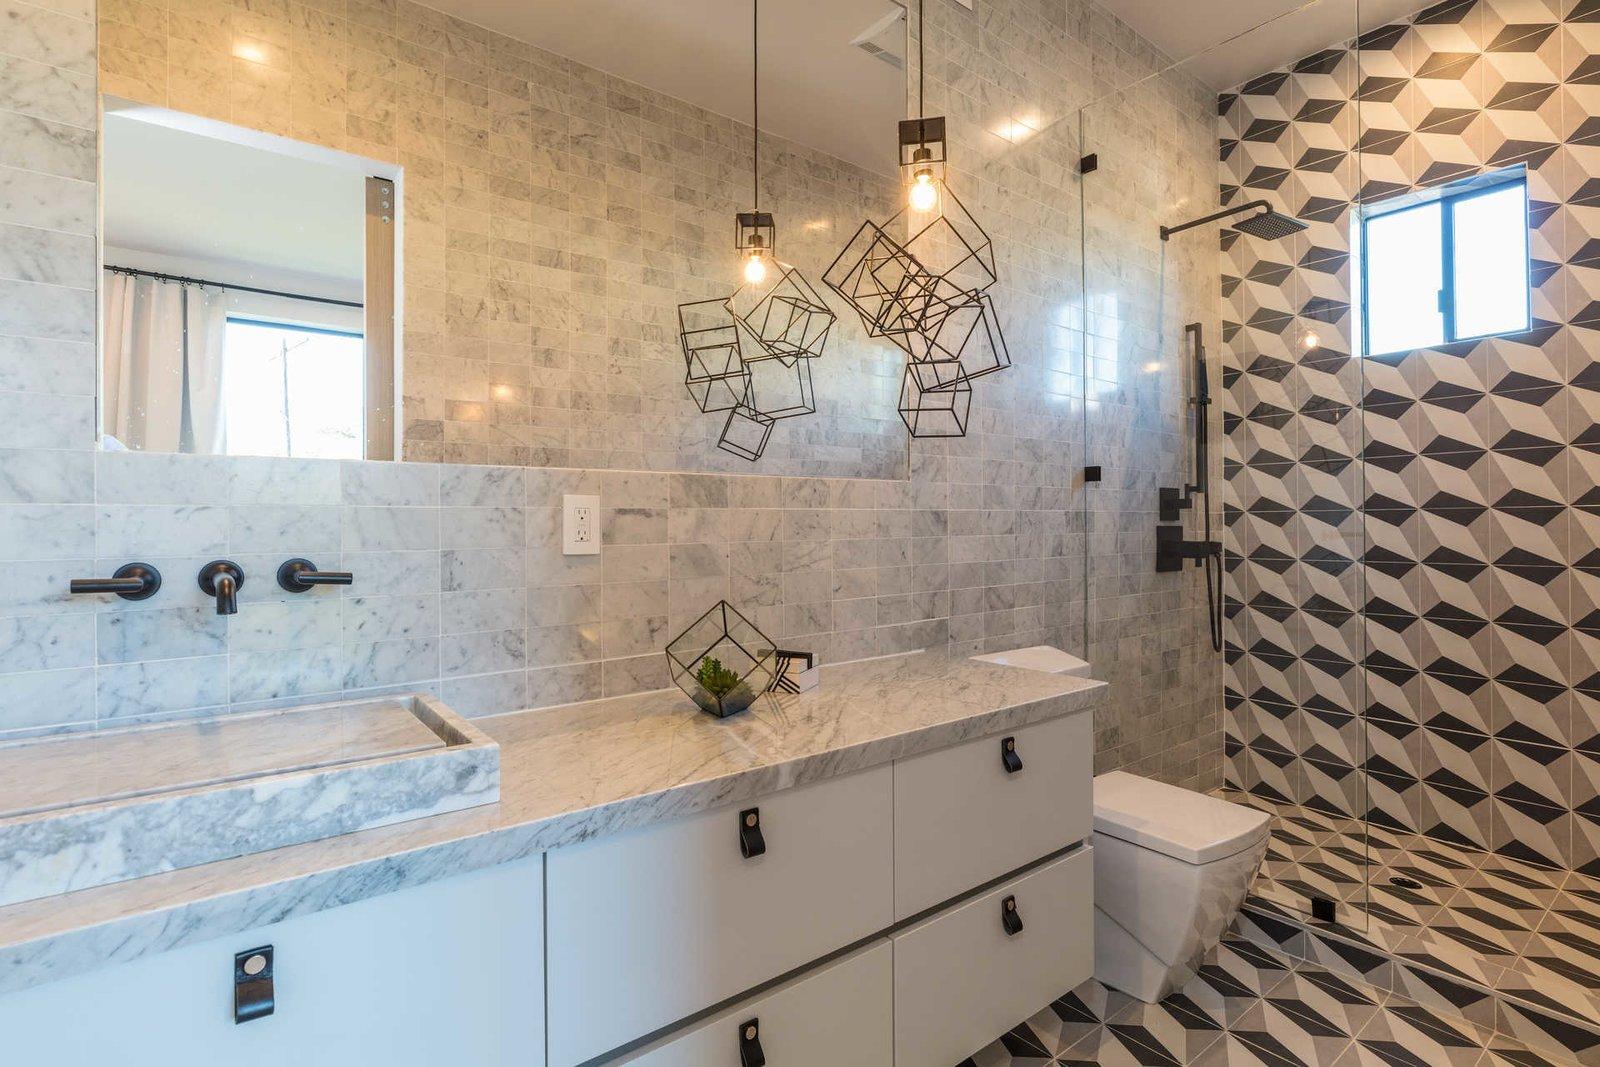 Bath Room, One Piece Toilet, Ceiling Lighting, Pendant Lighting, Corner Shower, and Enclosed Shower  Italian Modernist Home